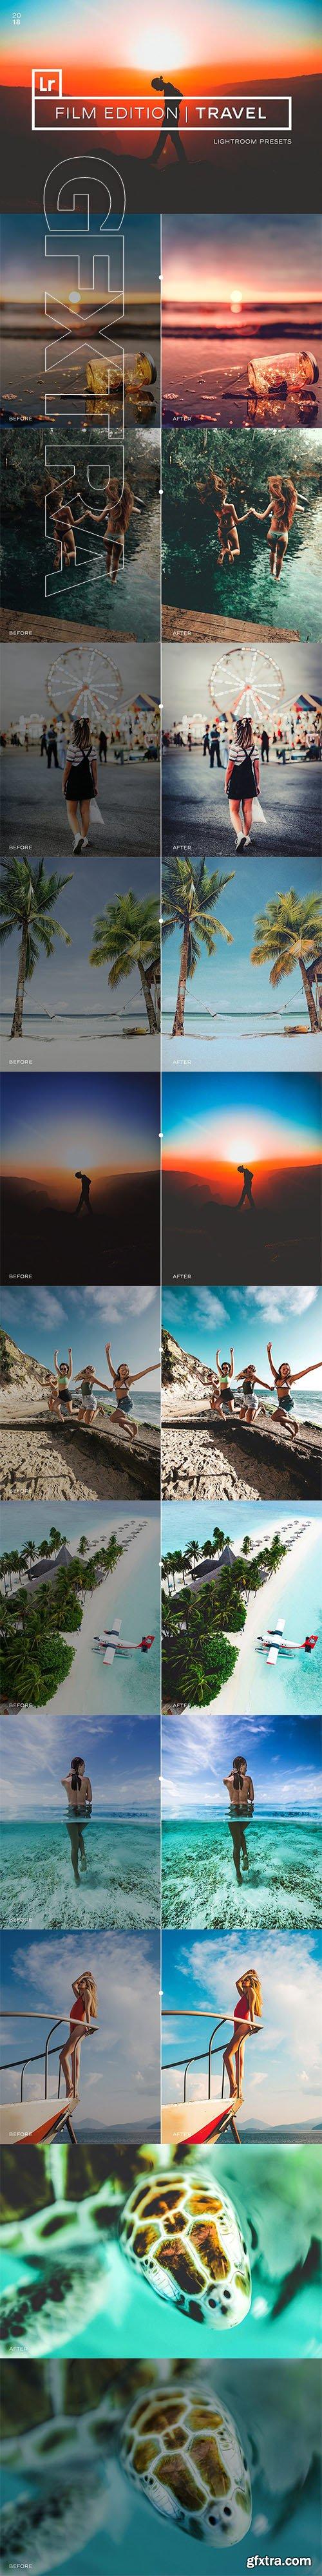 CreativeMarket - 100+ Film Travel Lightroom Presets 2708397